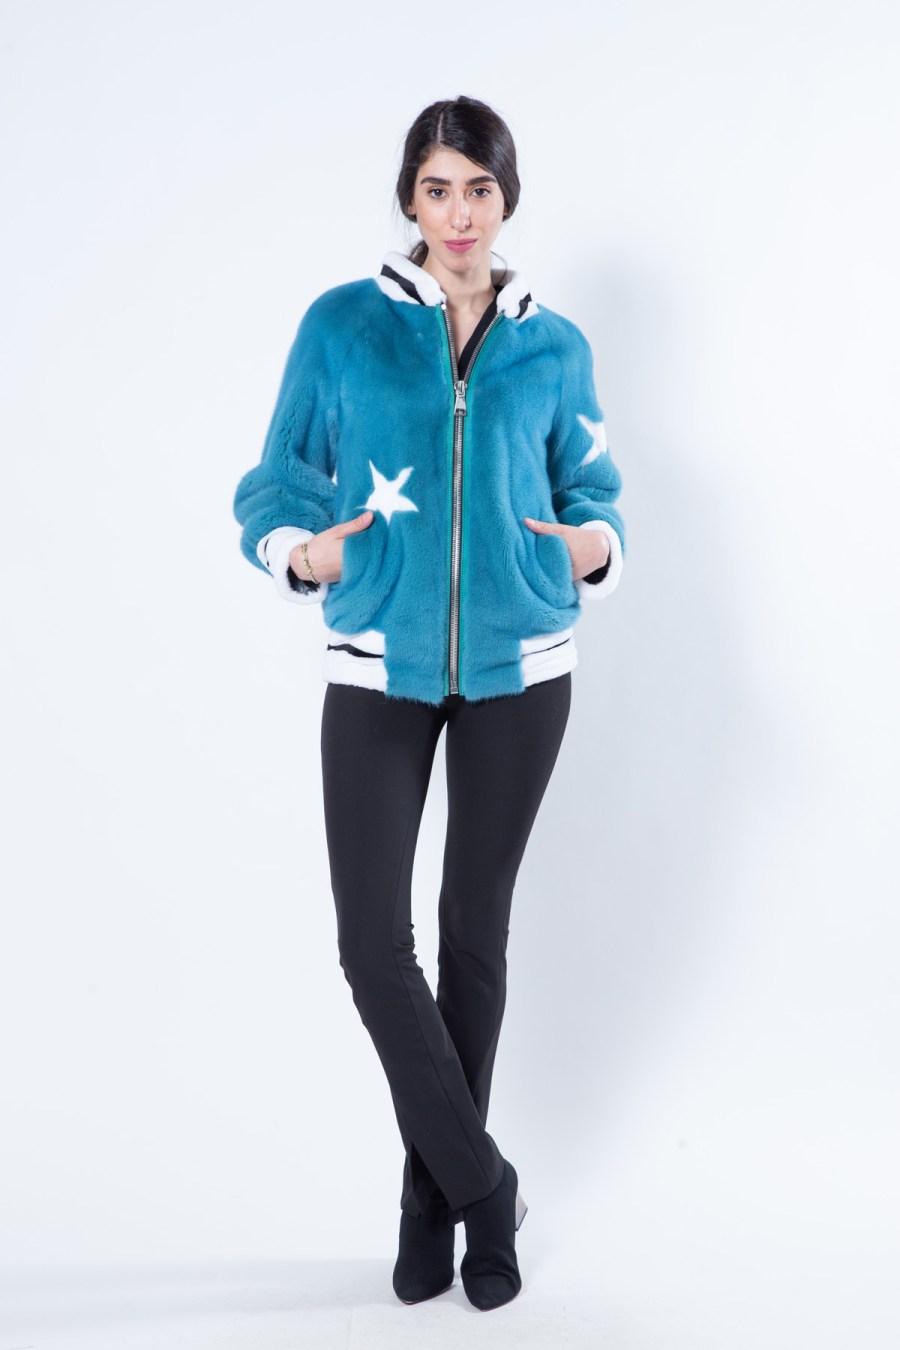 Teal Blue Mink Jacket | Пальто из меха норки цвета Teal Blue - Sarigianni Furs